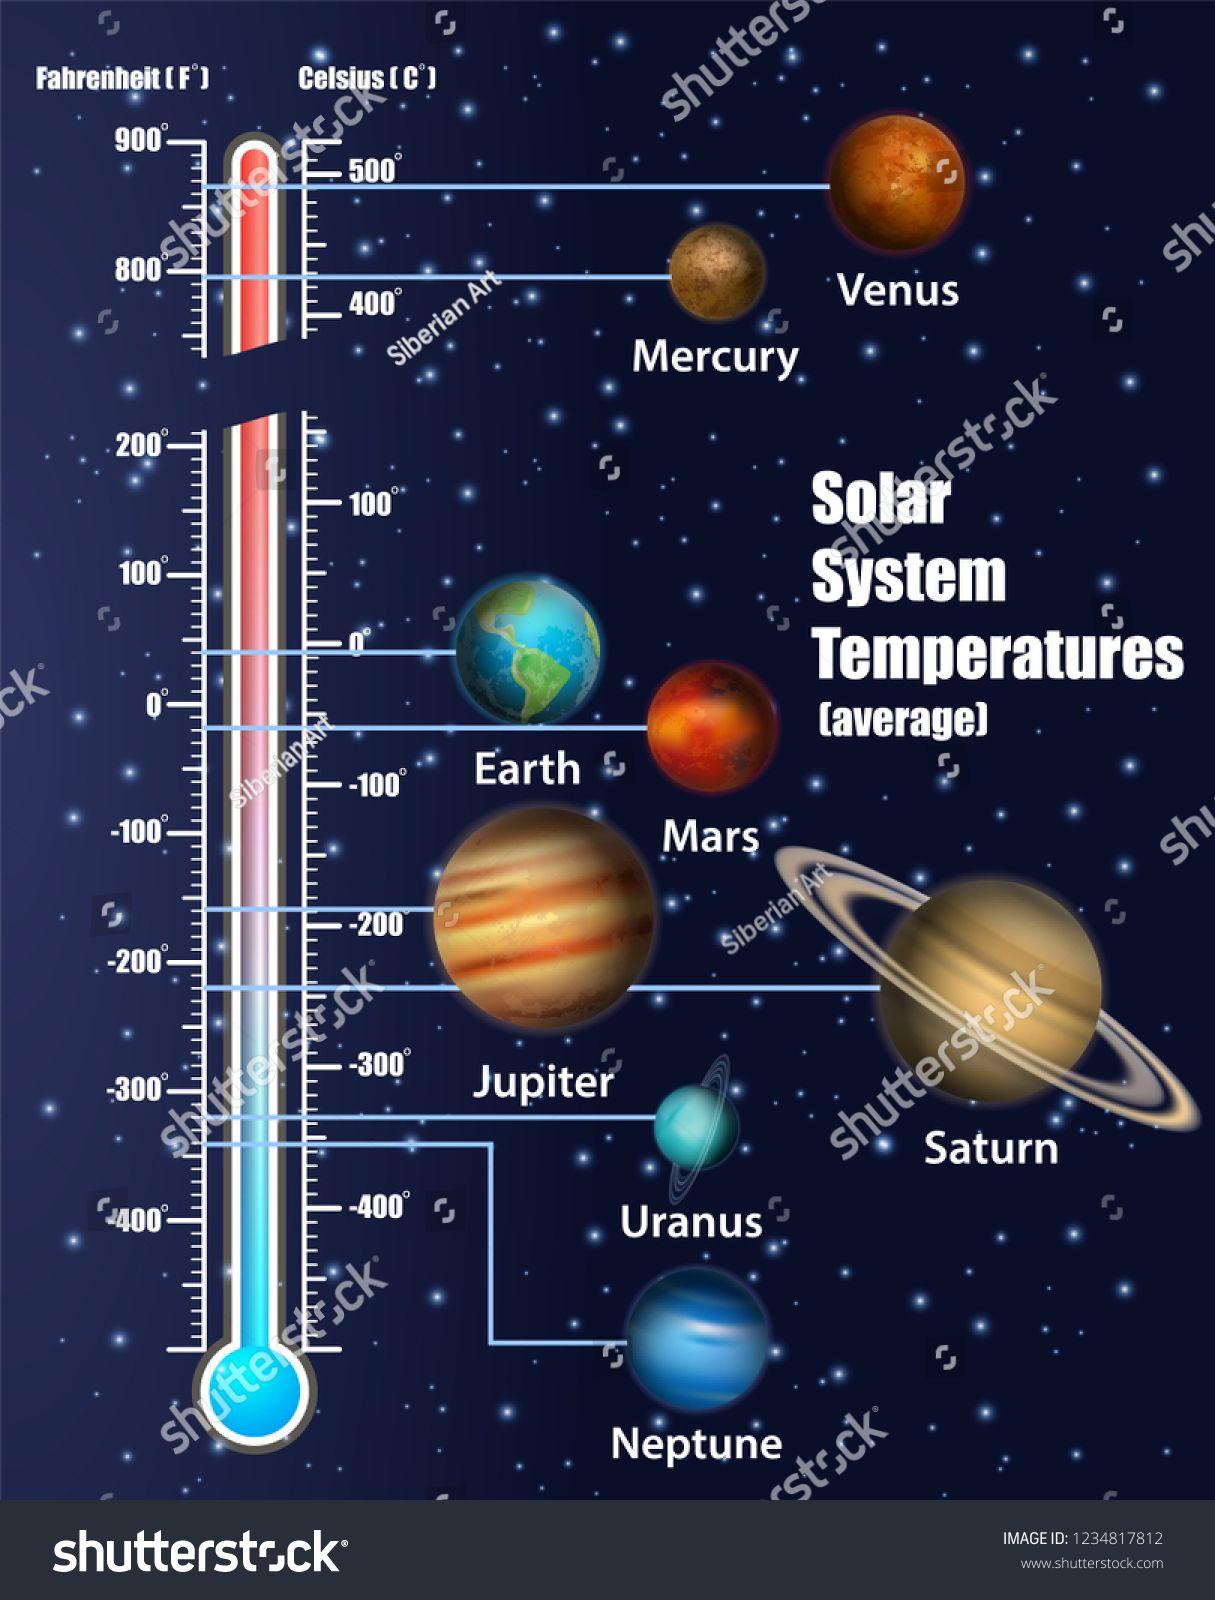 Solar System Temperatures Diagram Vector Educational Poster Scientific Infographic Presentation Solar System Exploration Education Poster Astronomy Science